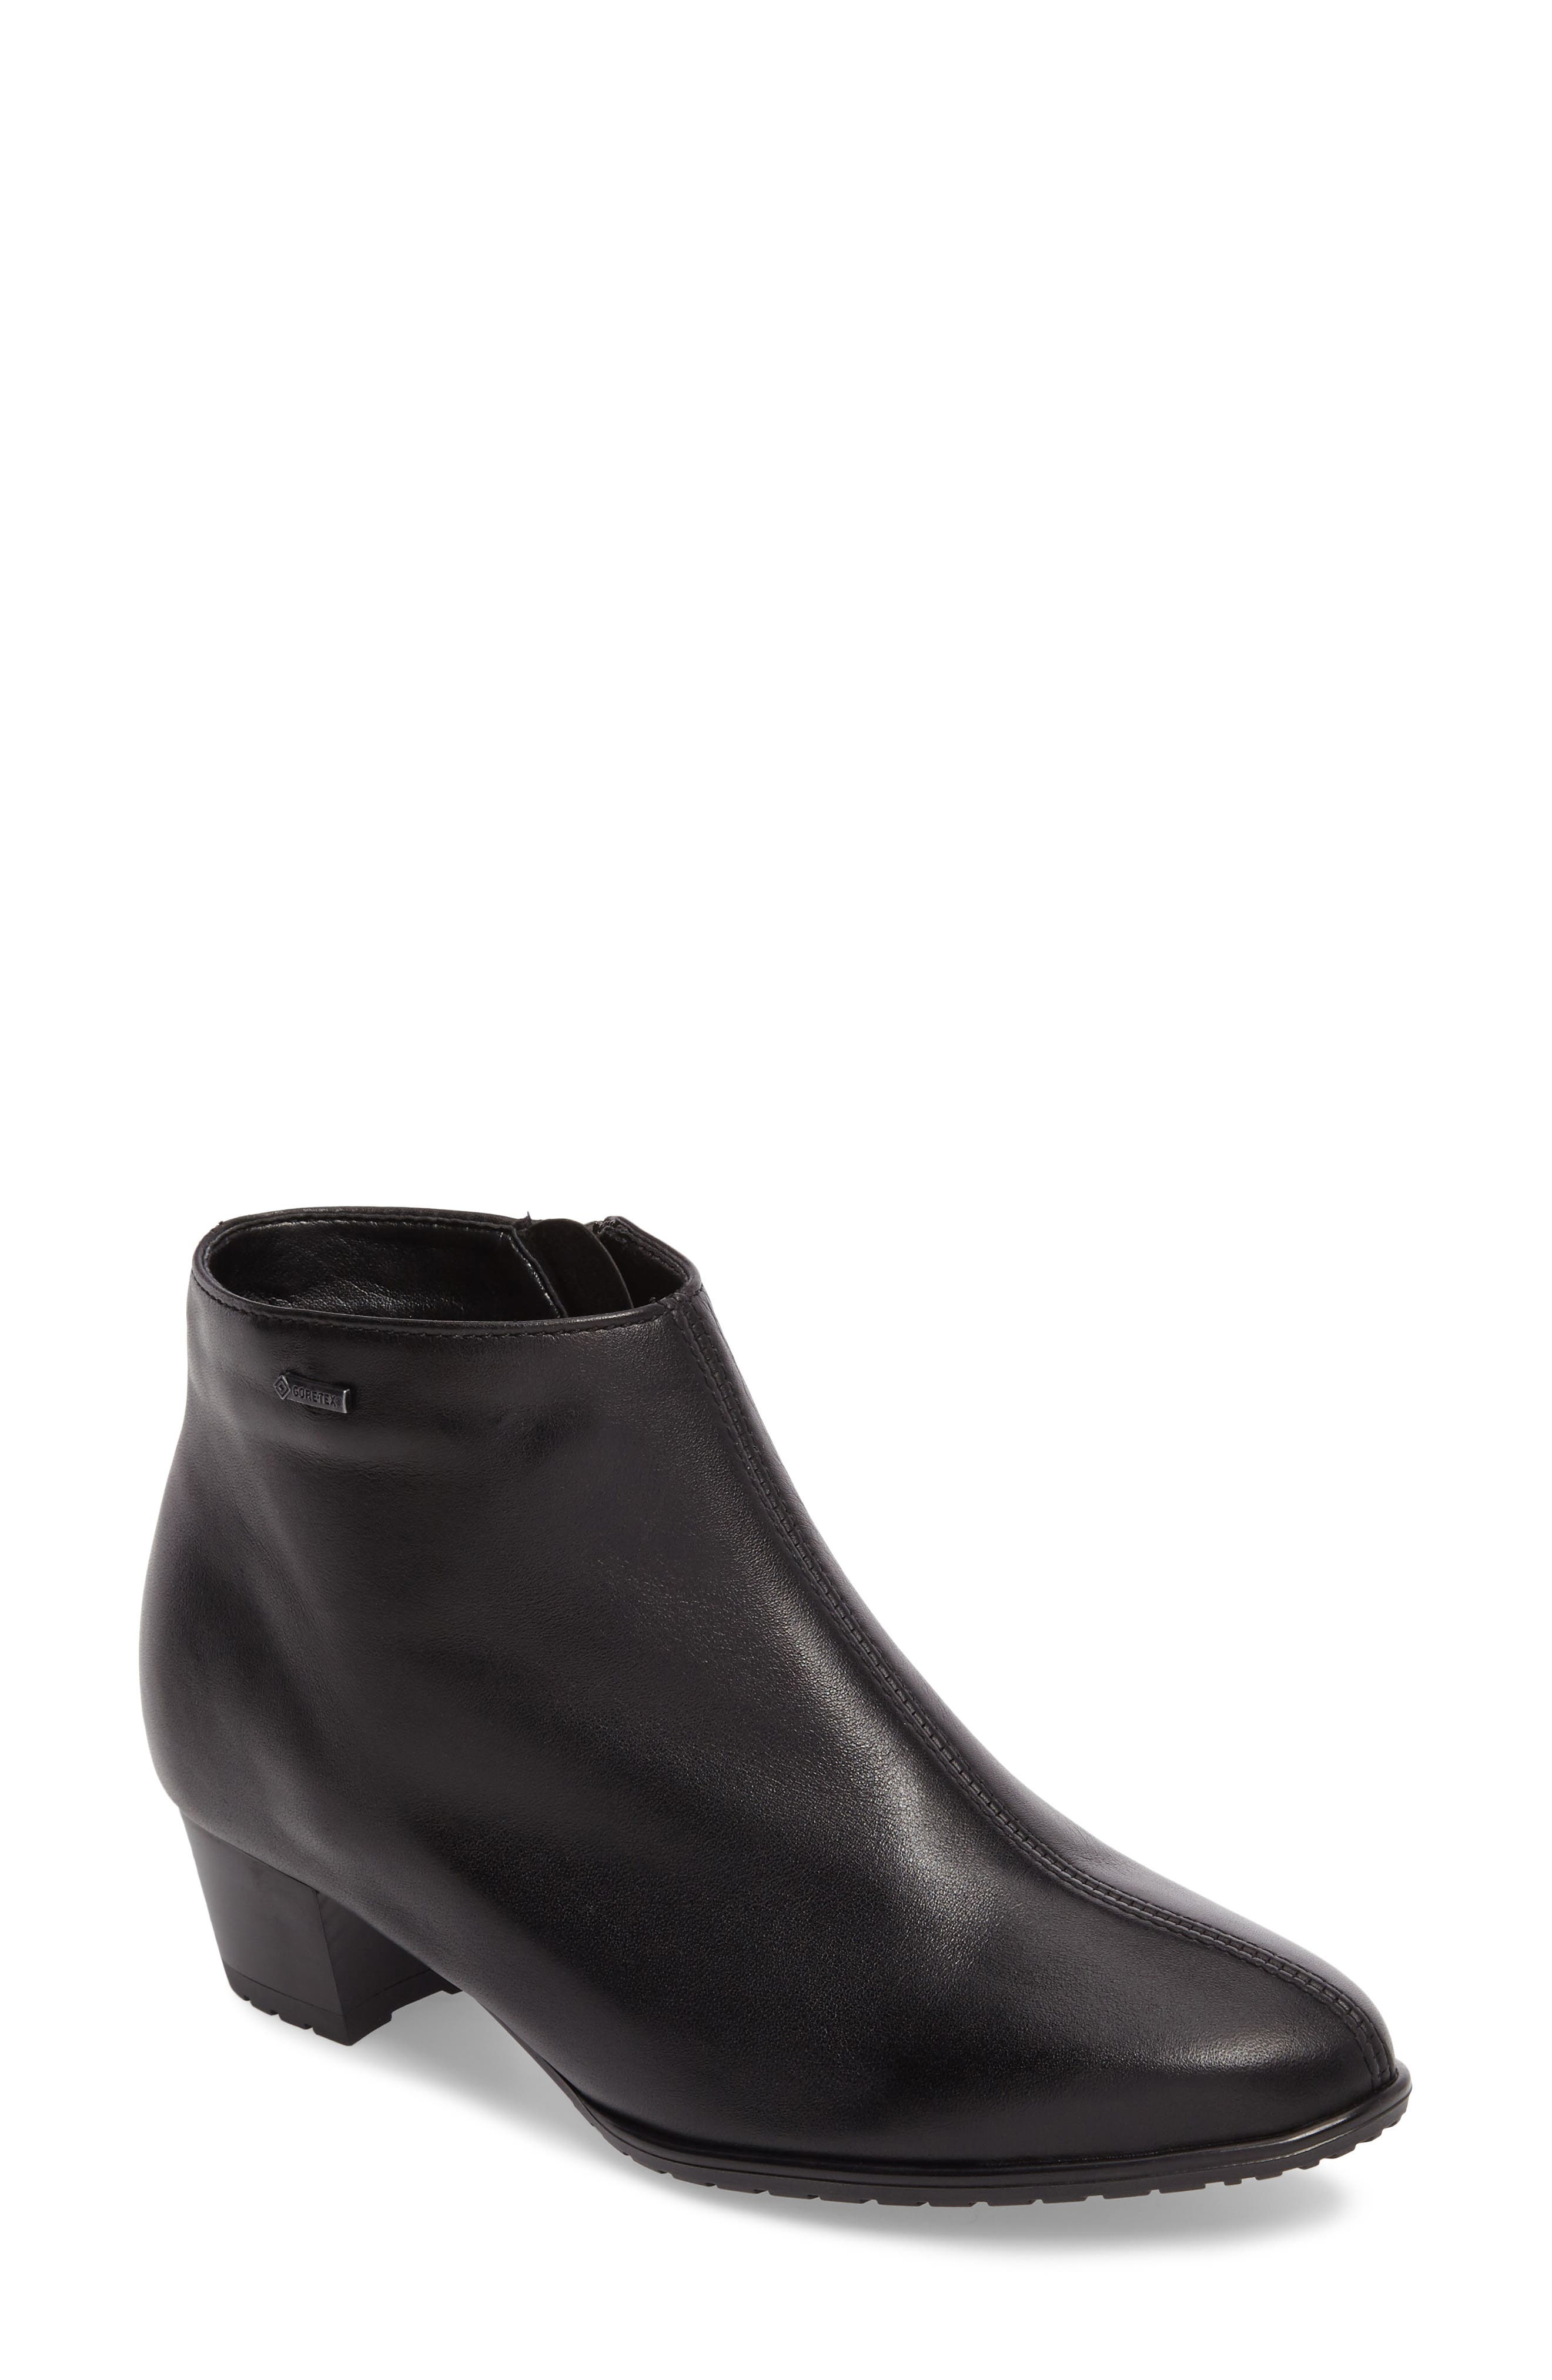 Alternate Image 1 Selected - ara Prisha Waterproof Gore-Tex® Bootie (Women)